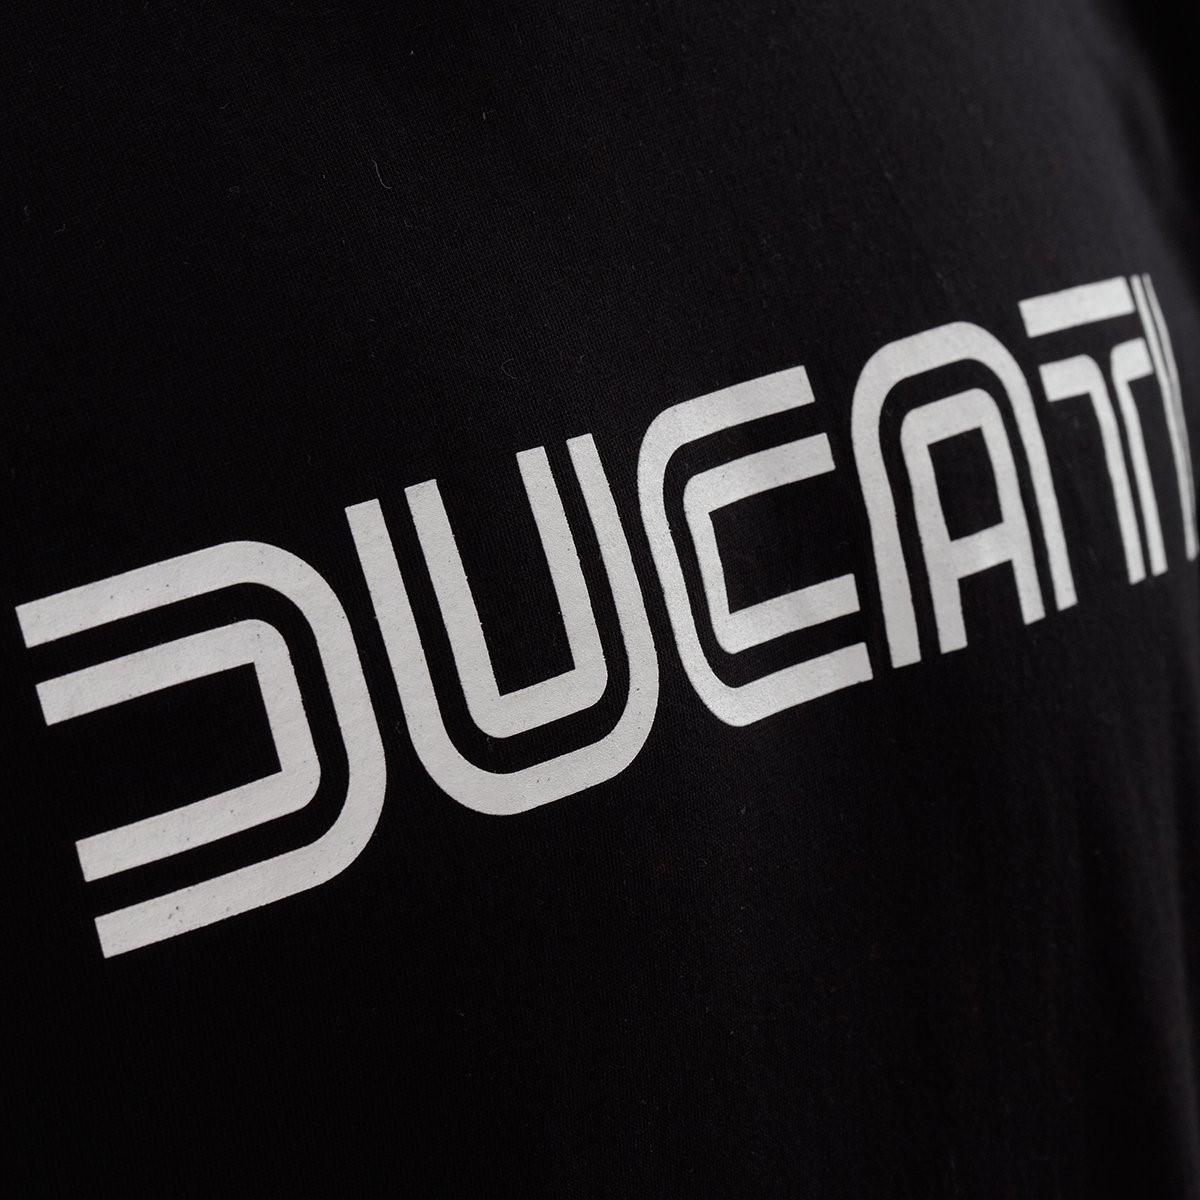 【DUCATI performance】Ducatiana 80s T恤 - 「Webike-摩托百貨」